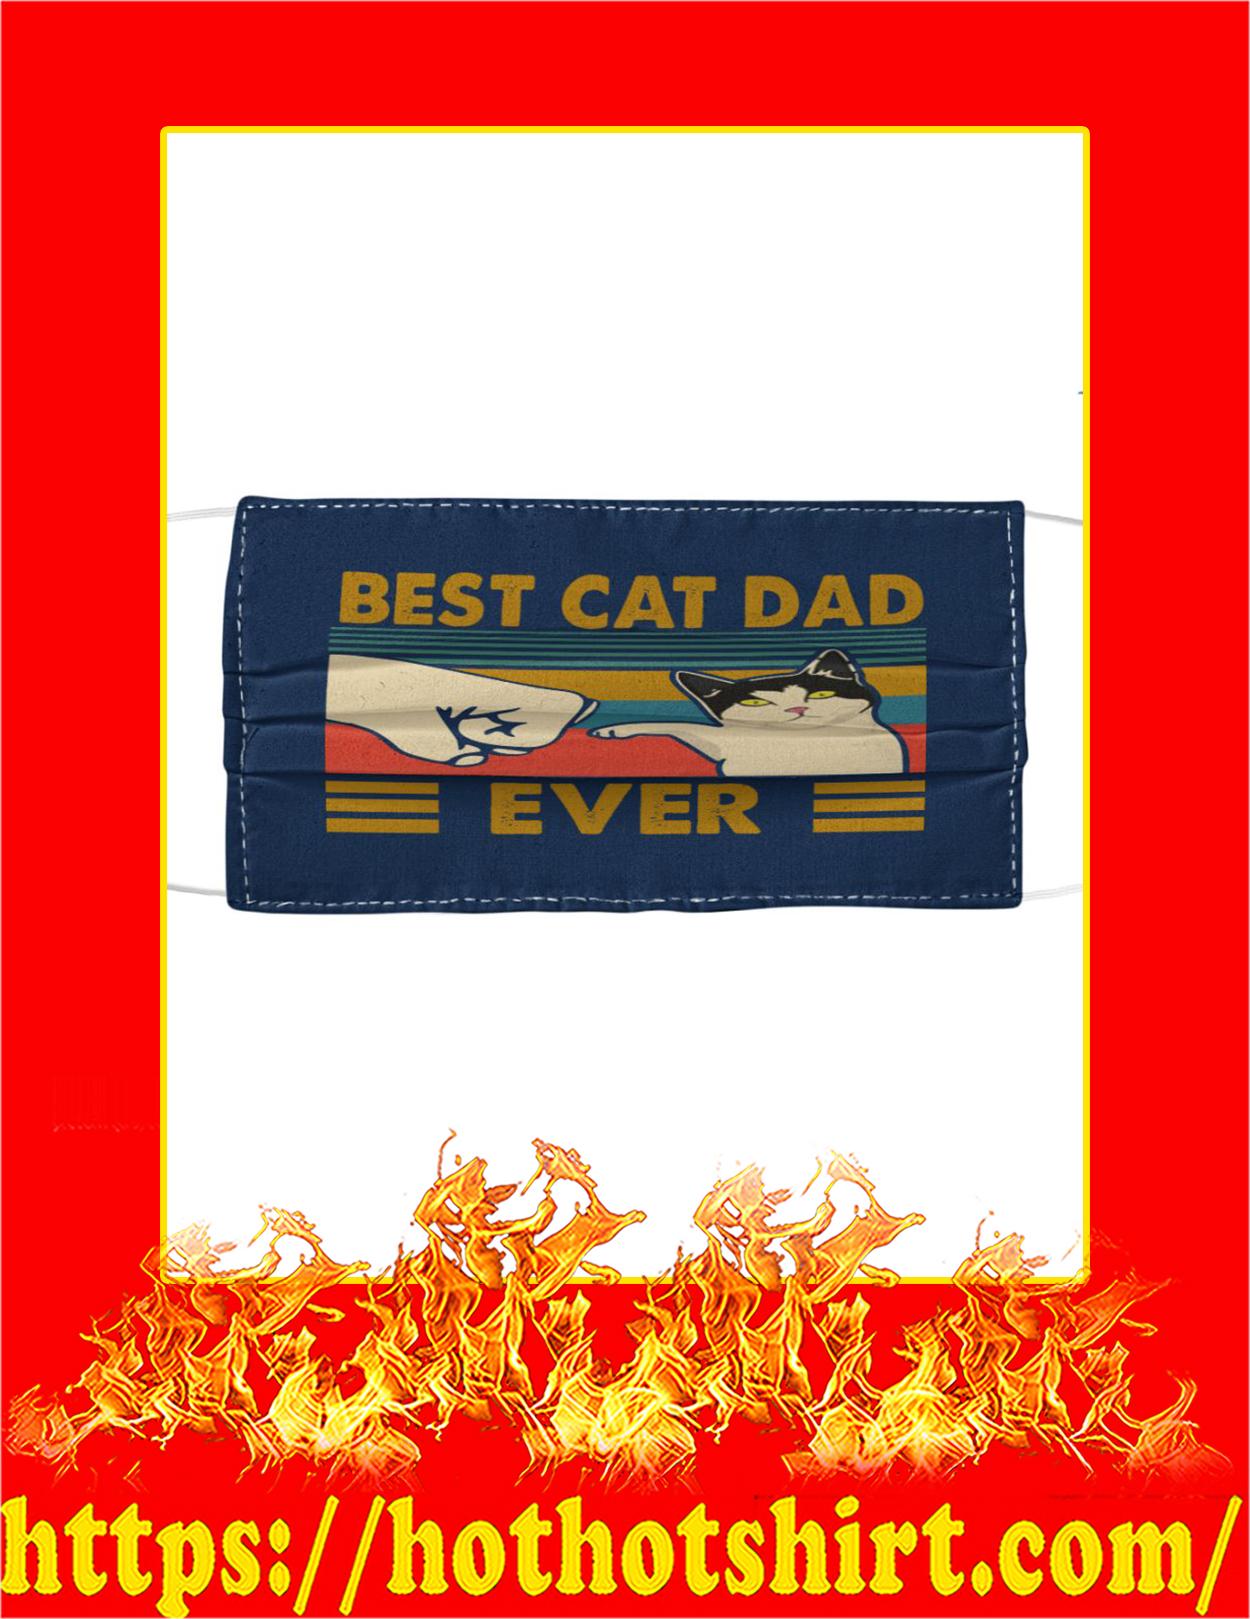 Best cat dad ever face mask - navi